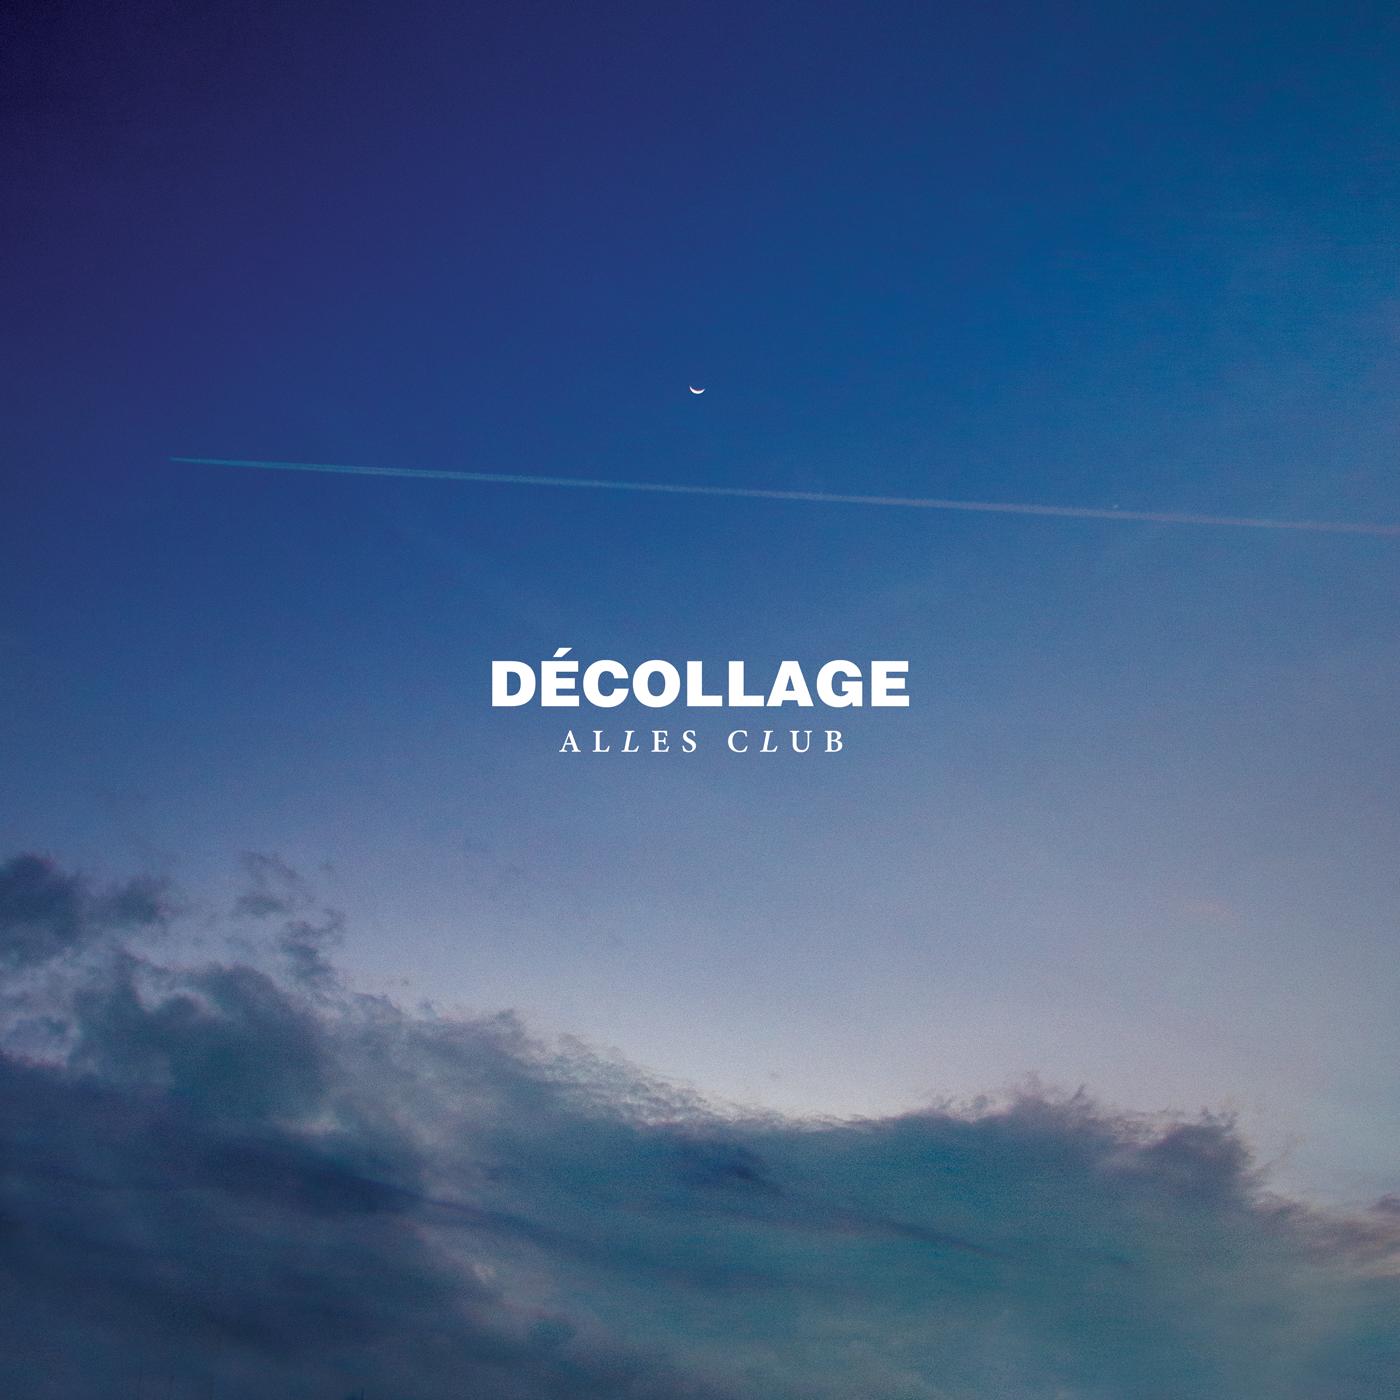 Cover developed for Alles Club's album Décollage